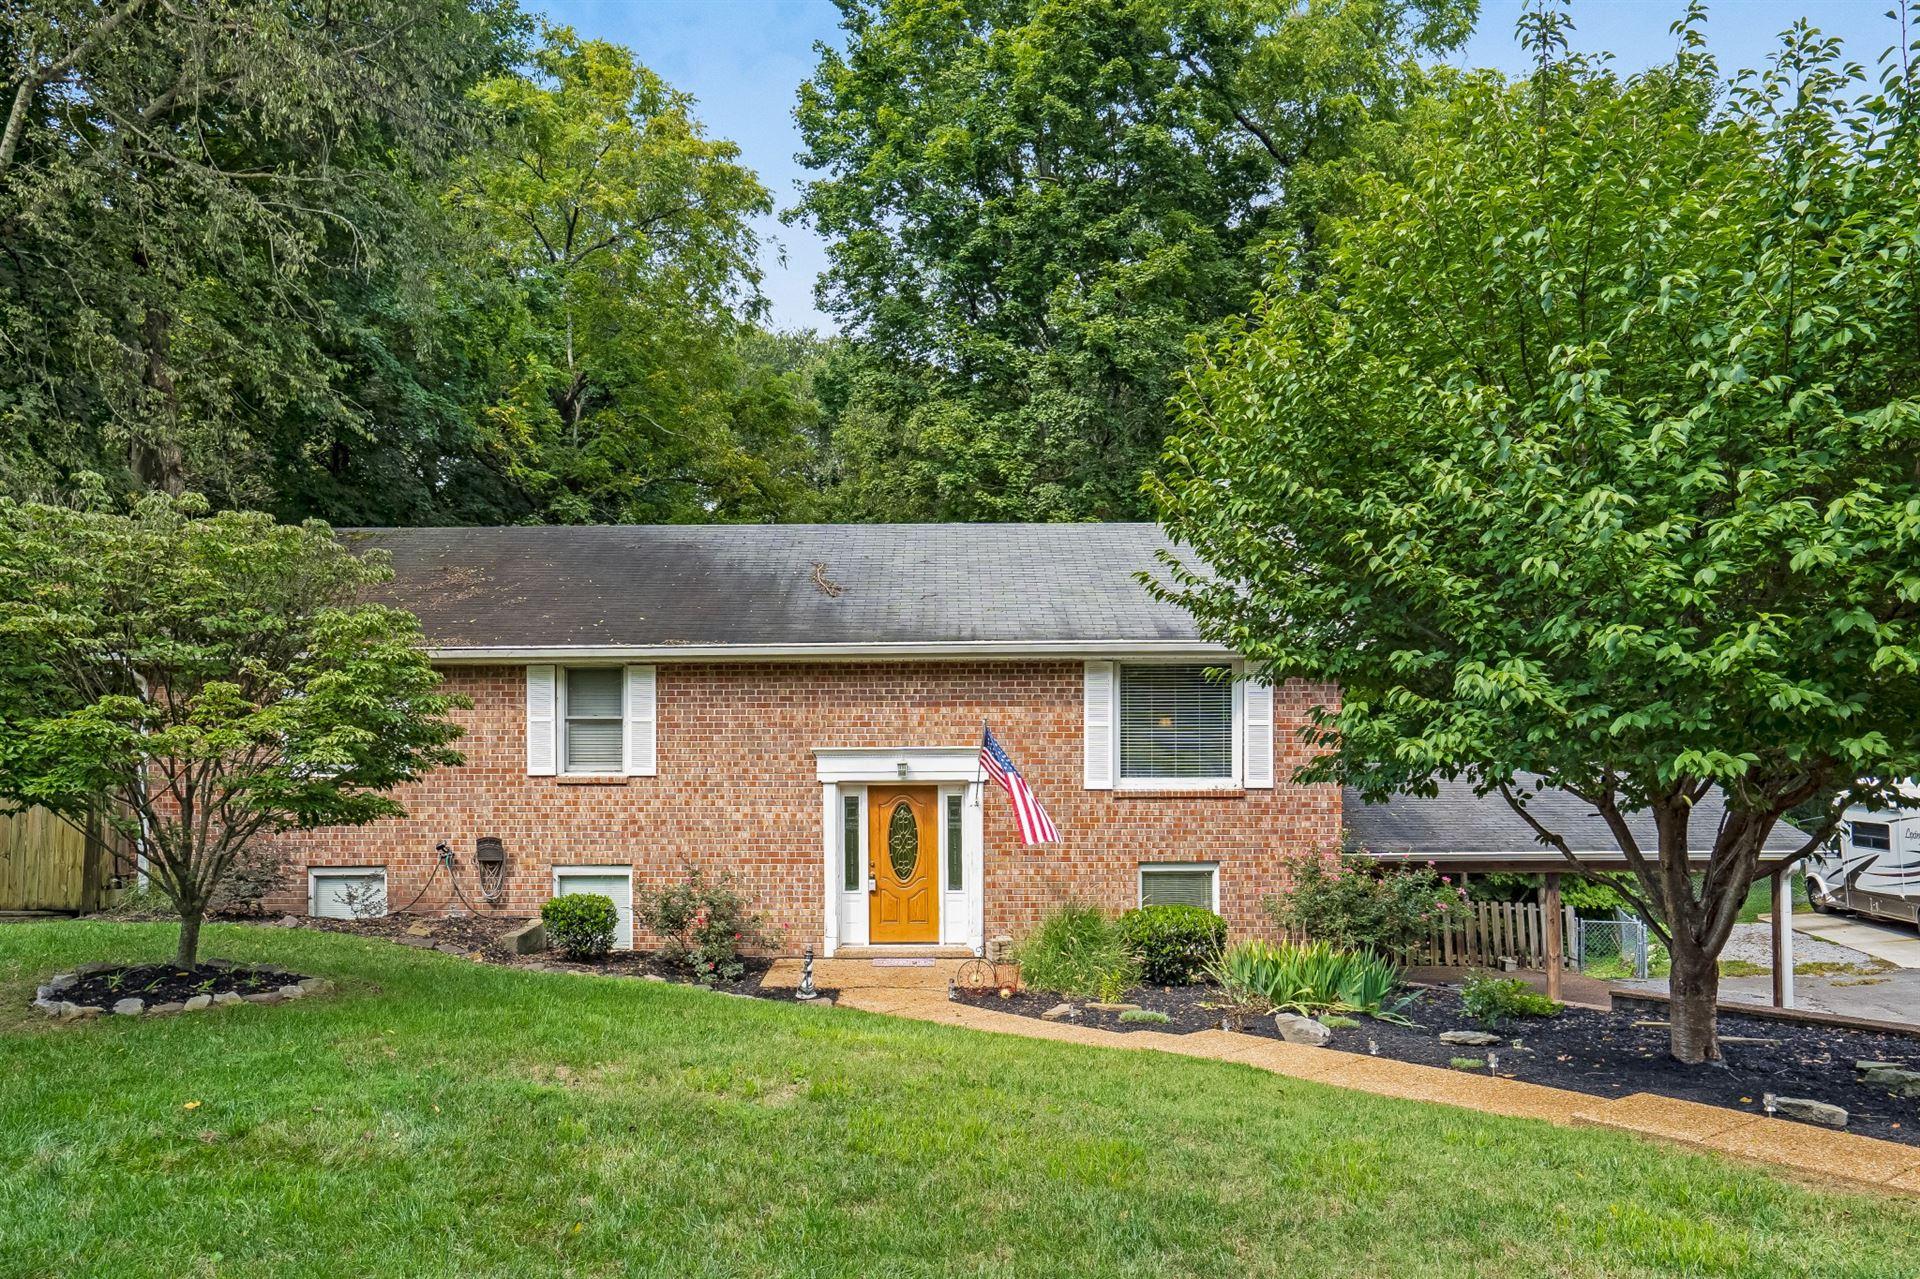 237 Green Harbor Rd, Old Hickory, TN 37138 - MLS#: 2285702